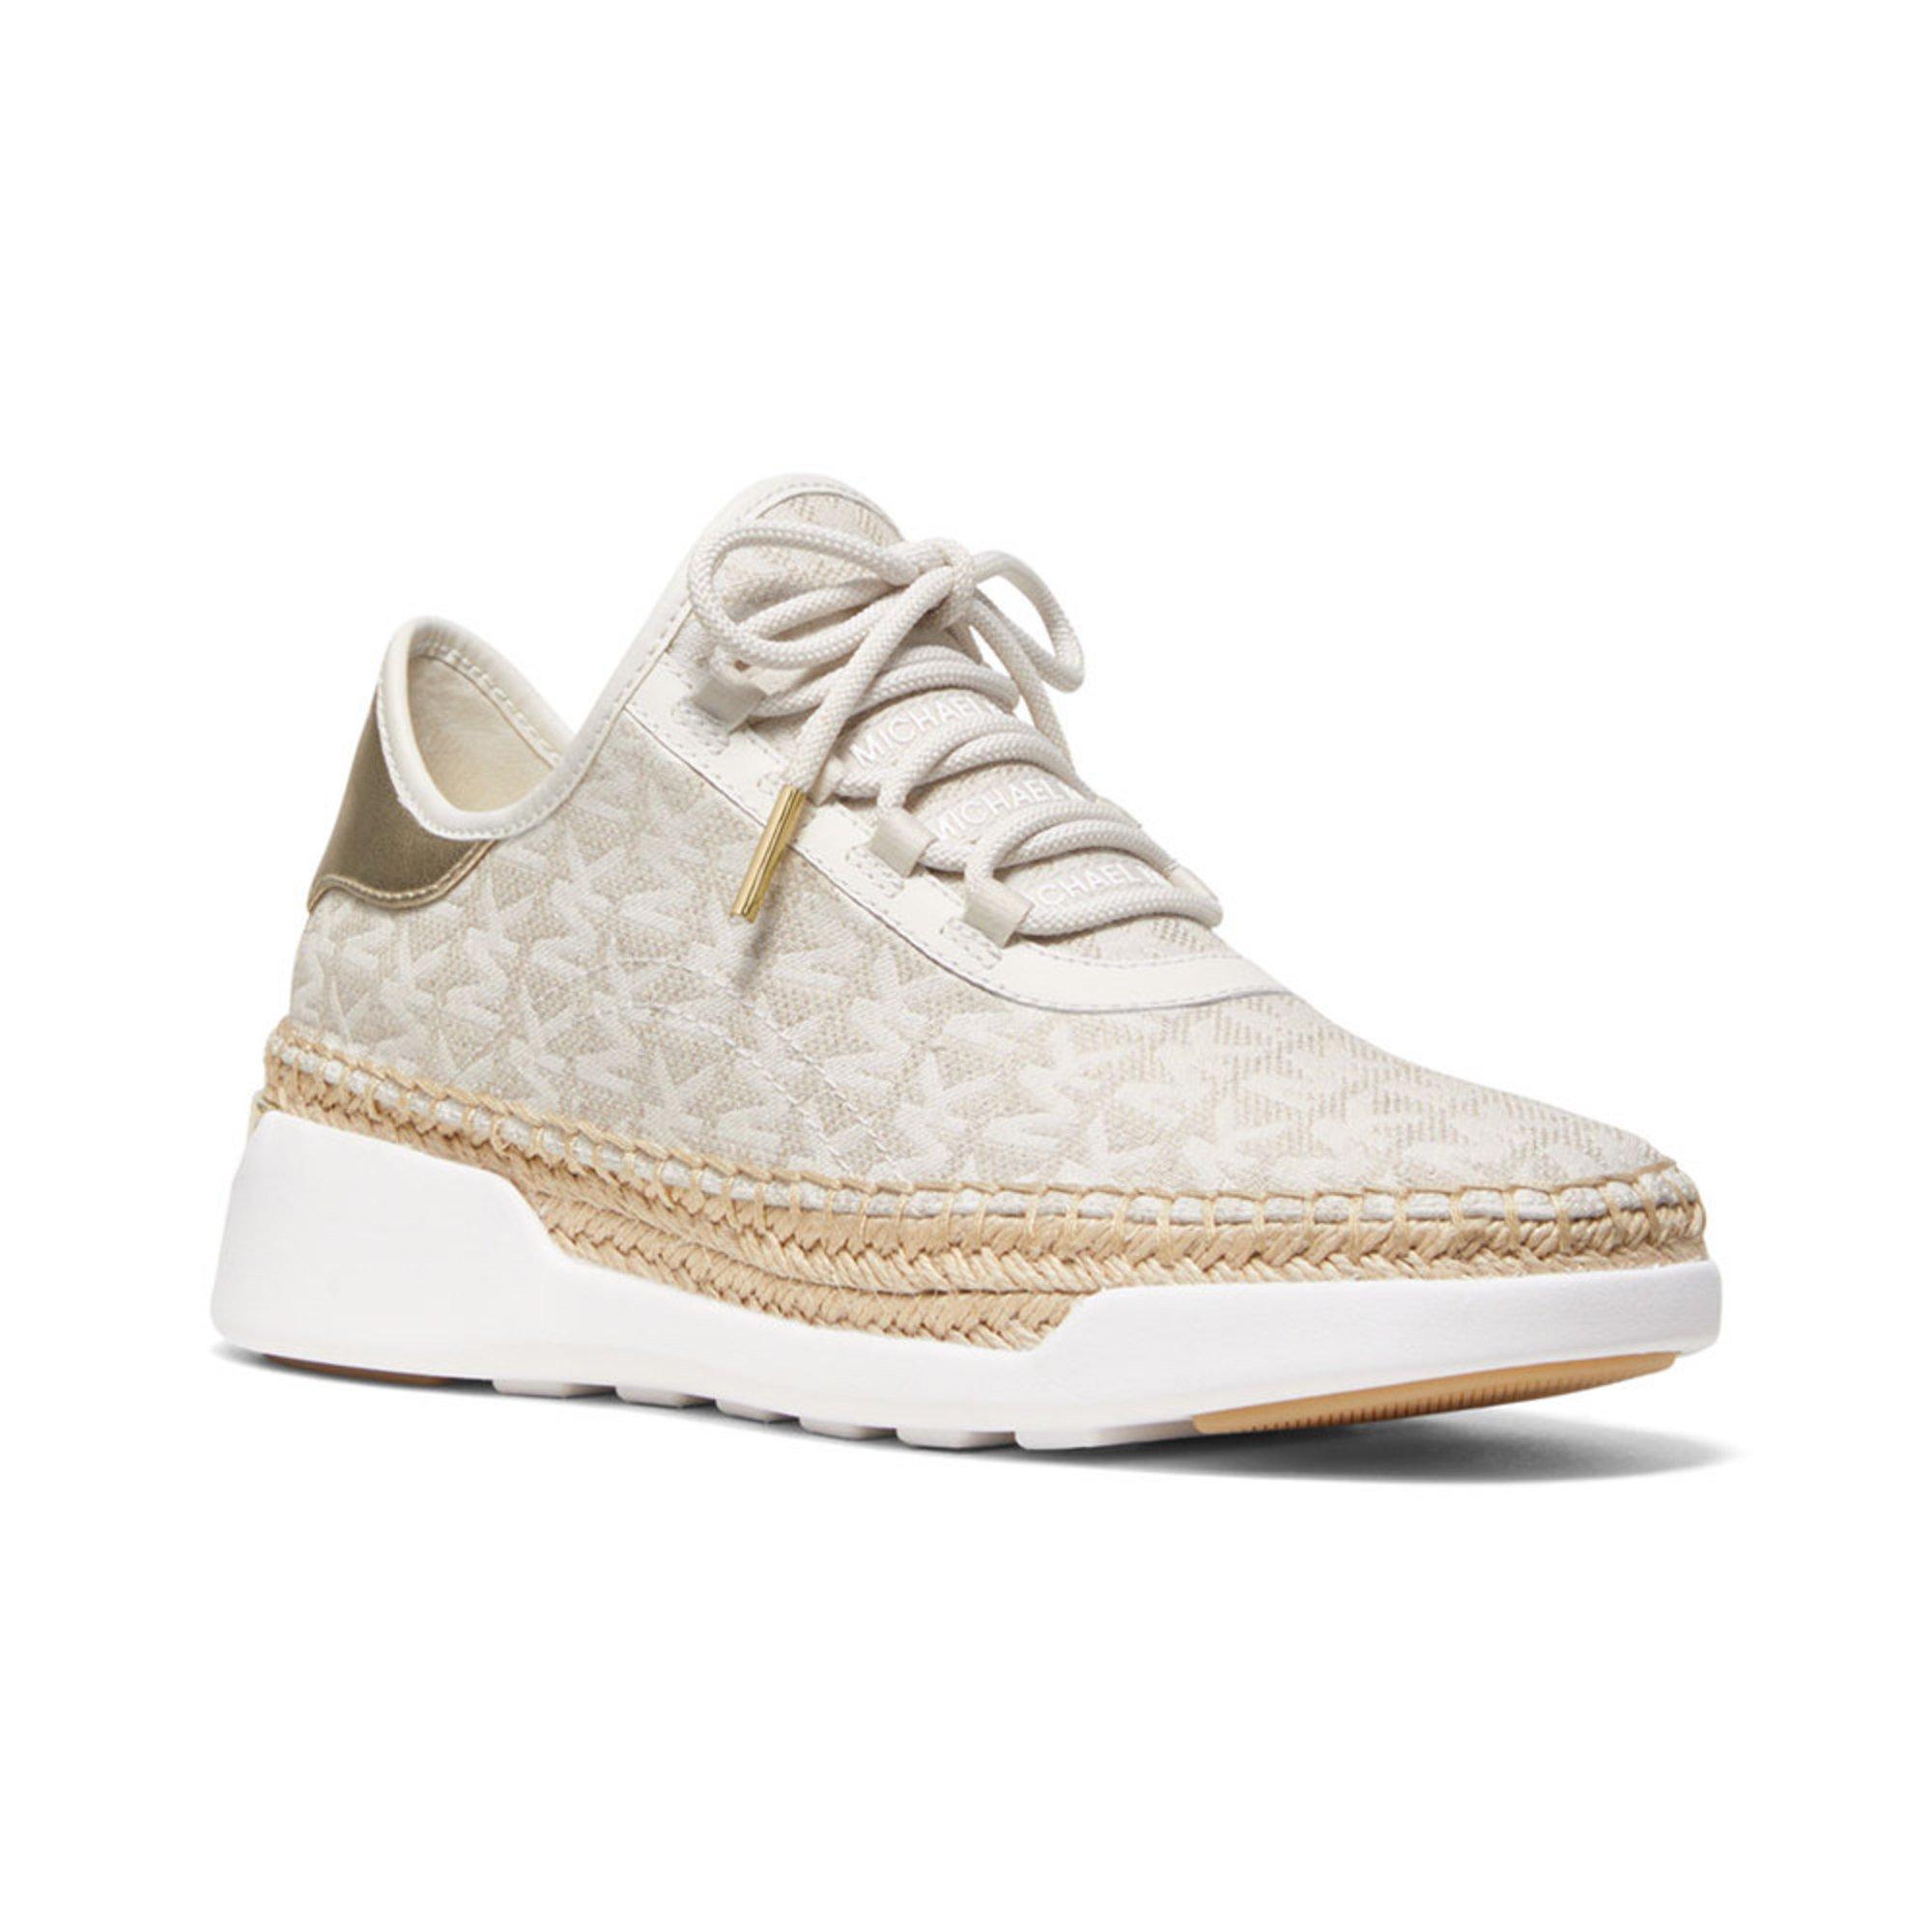 653cd79770e Michael Kors Finch Lace Up | Women's Sneakers | Shoes - Shop Your ...